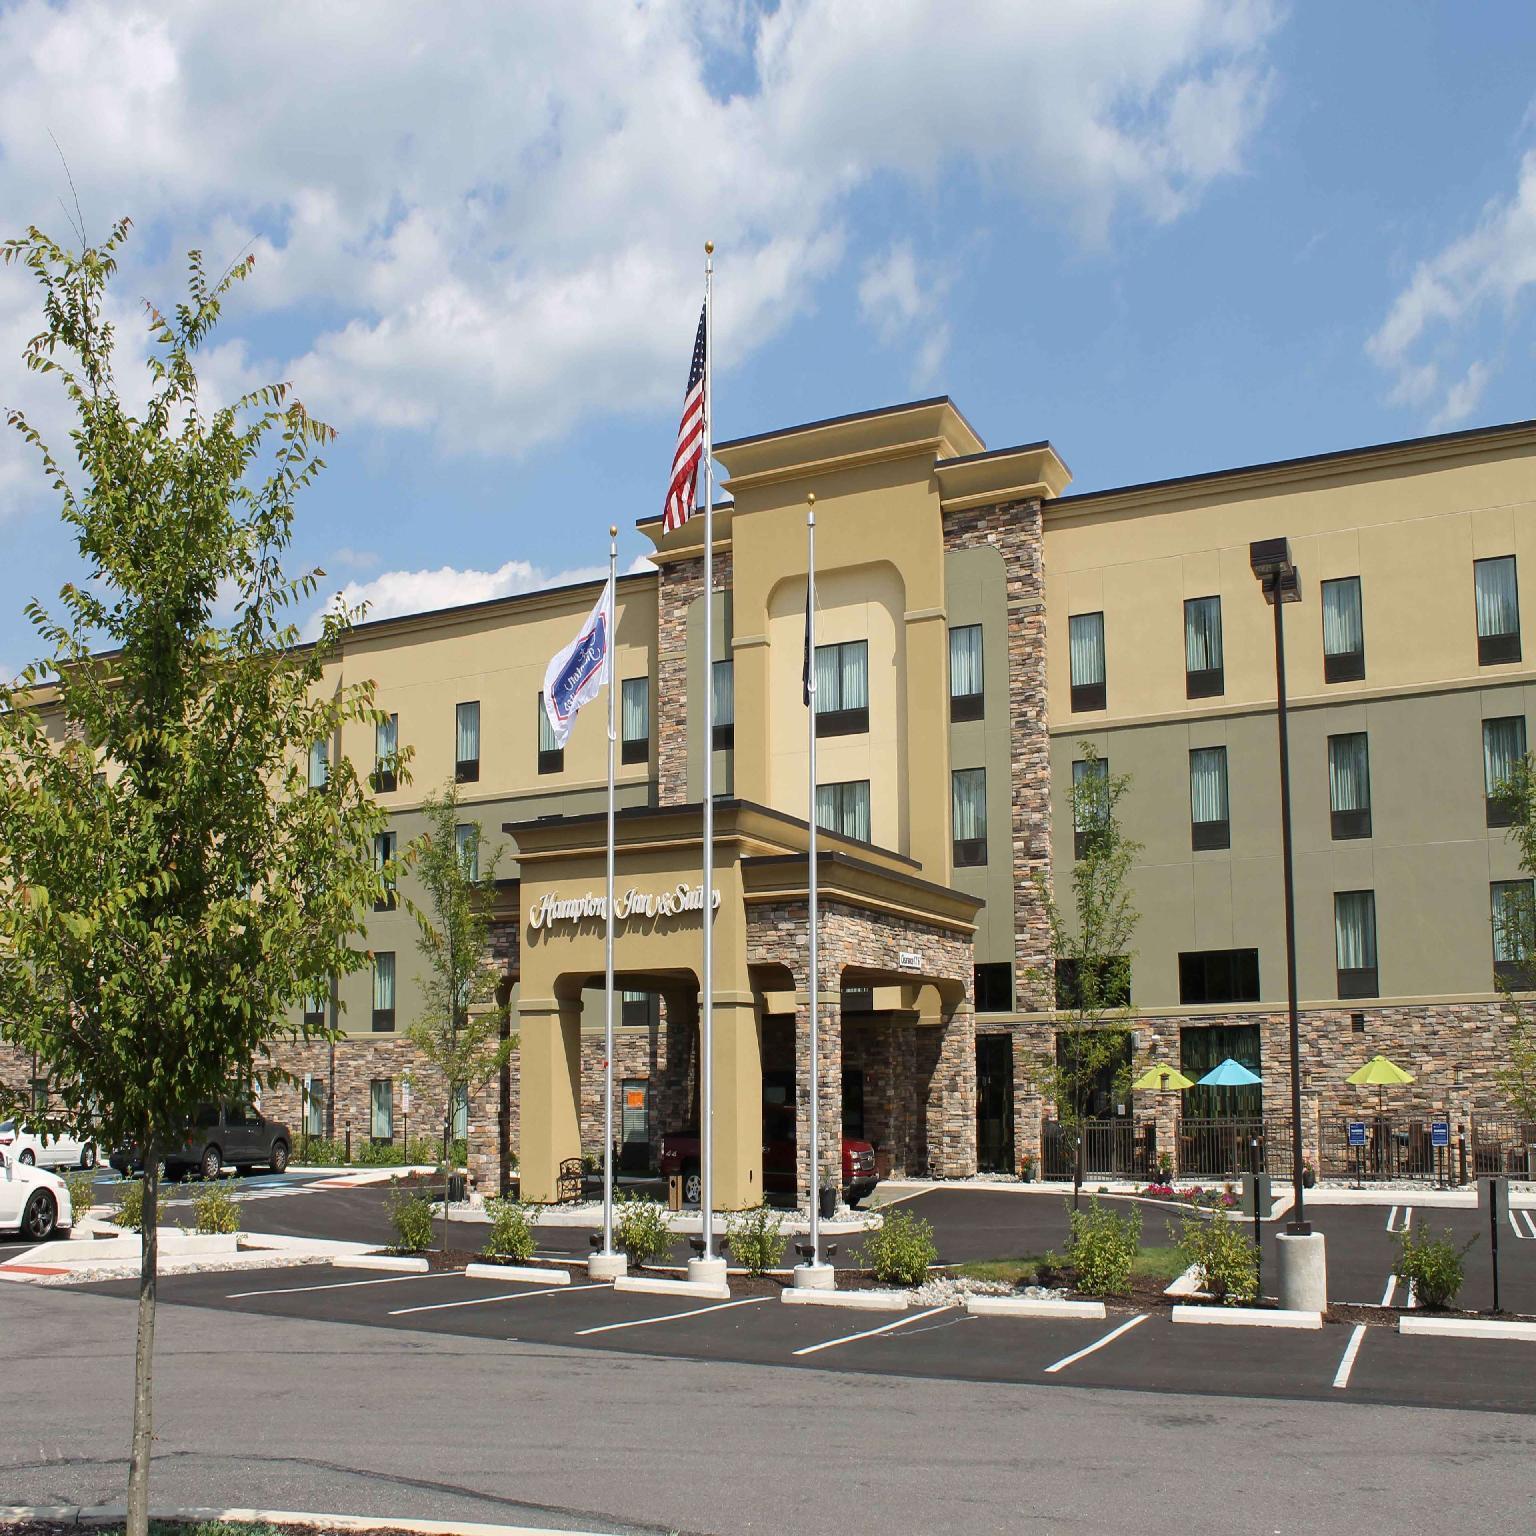 Hampton Inn And Suites Stroudsburg Bartonsville